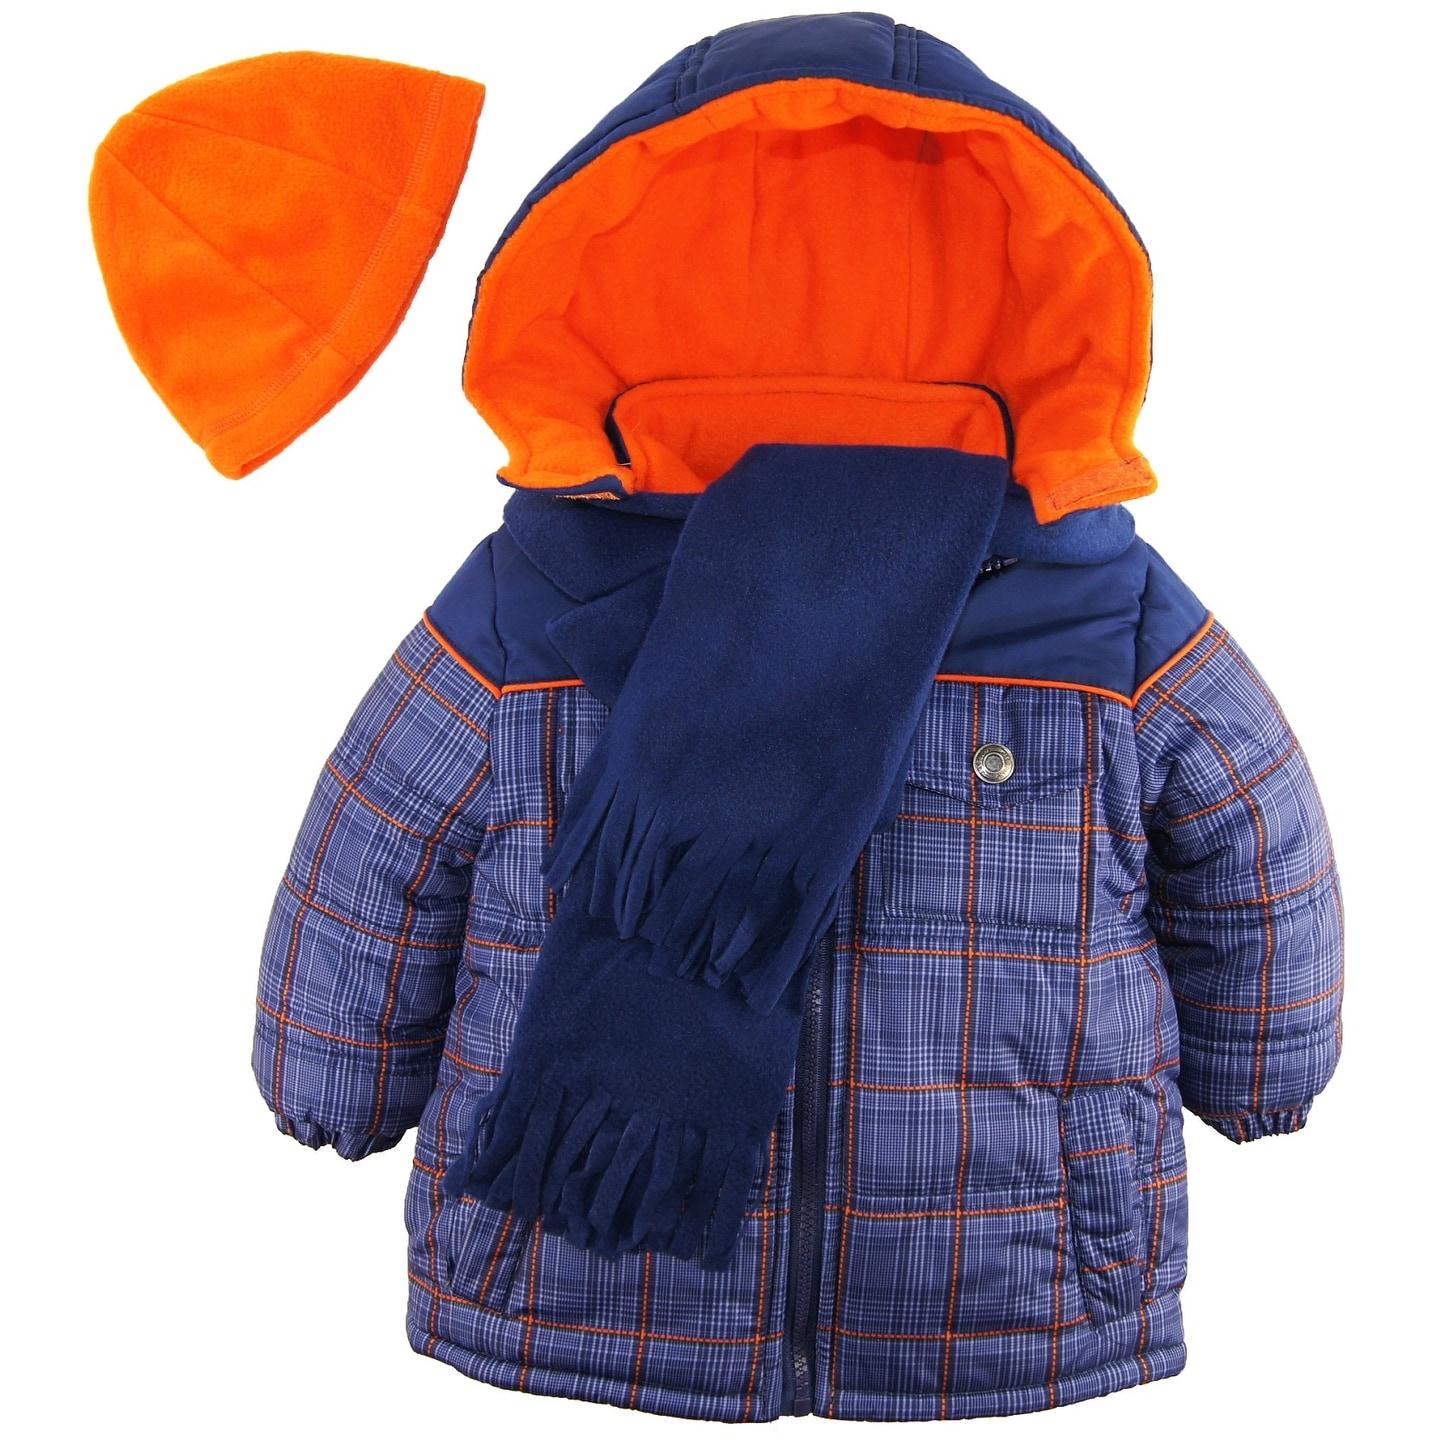 e065206b7 Shop iXtreme Toddler Boys Plaid Expedition Puffer Winter Coat Fleece ...